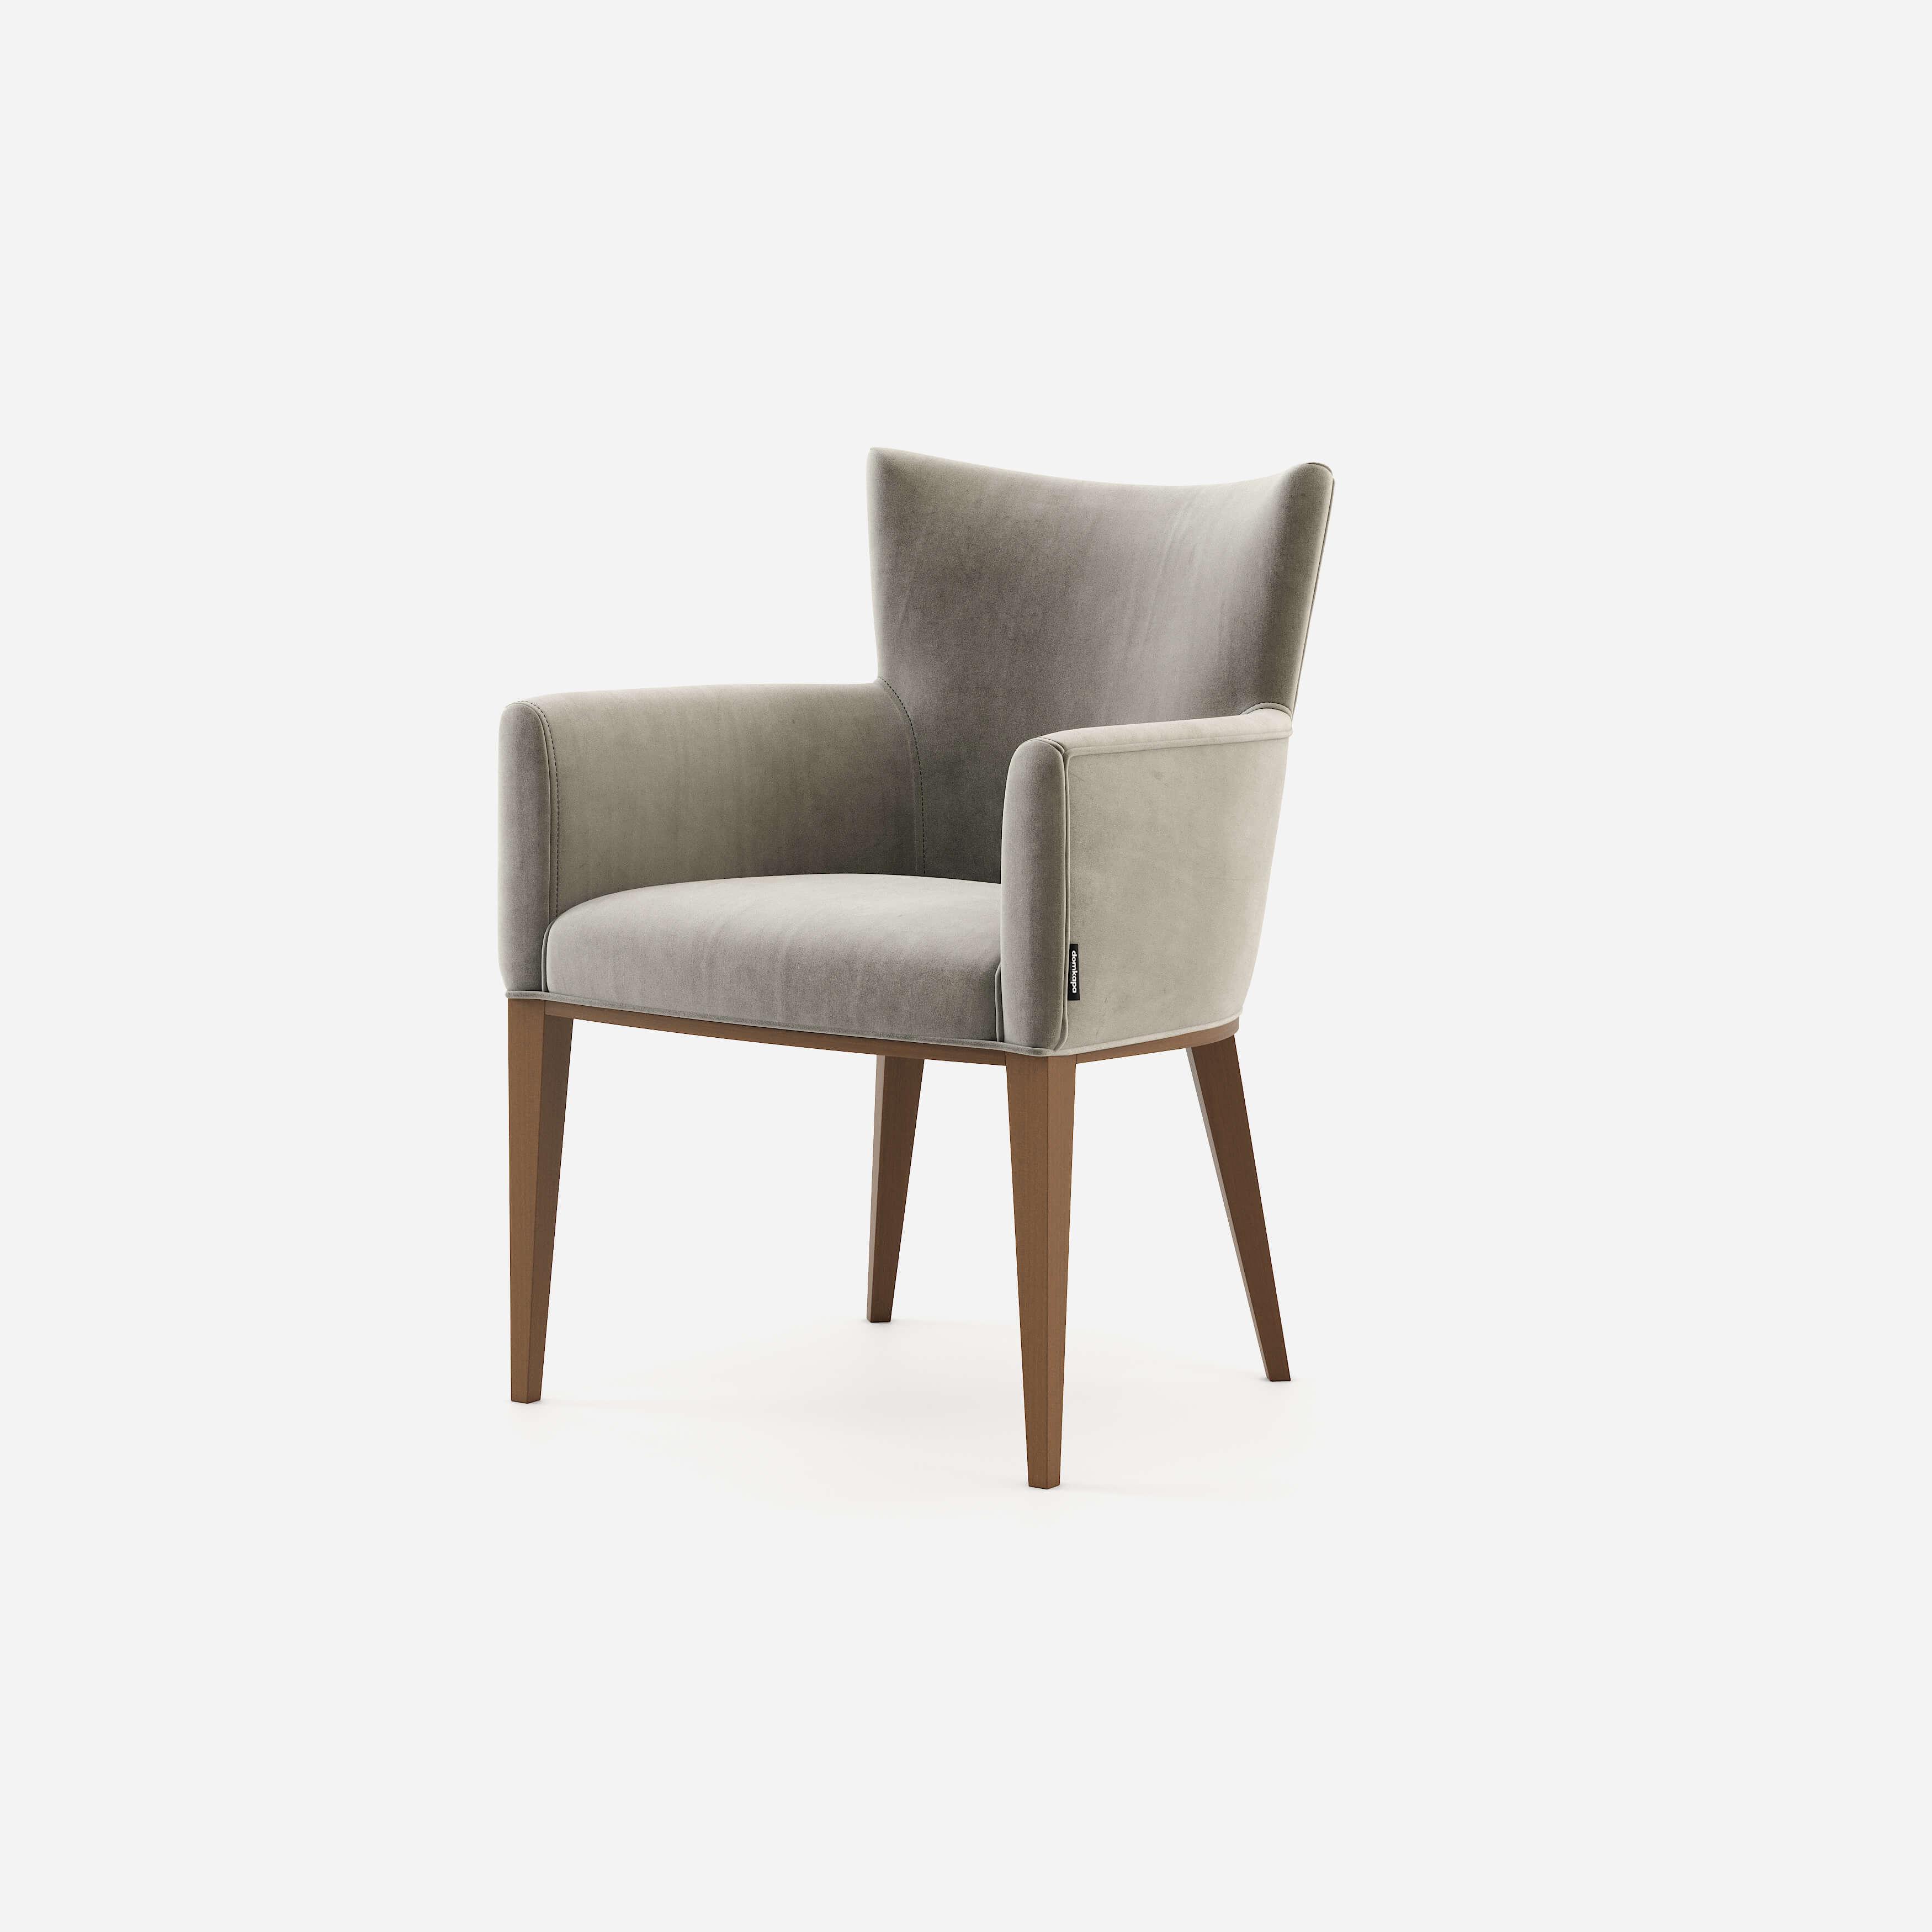 vianna-dining-armchair-interior-design-home-decor-dining-room-projects-domkapa-1